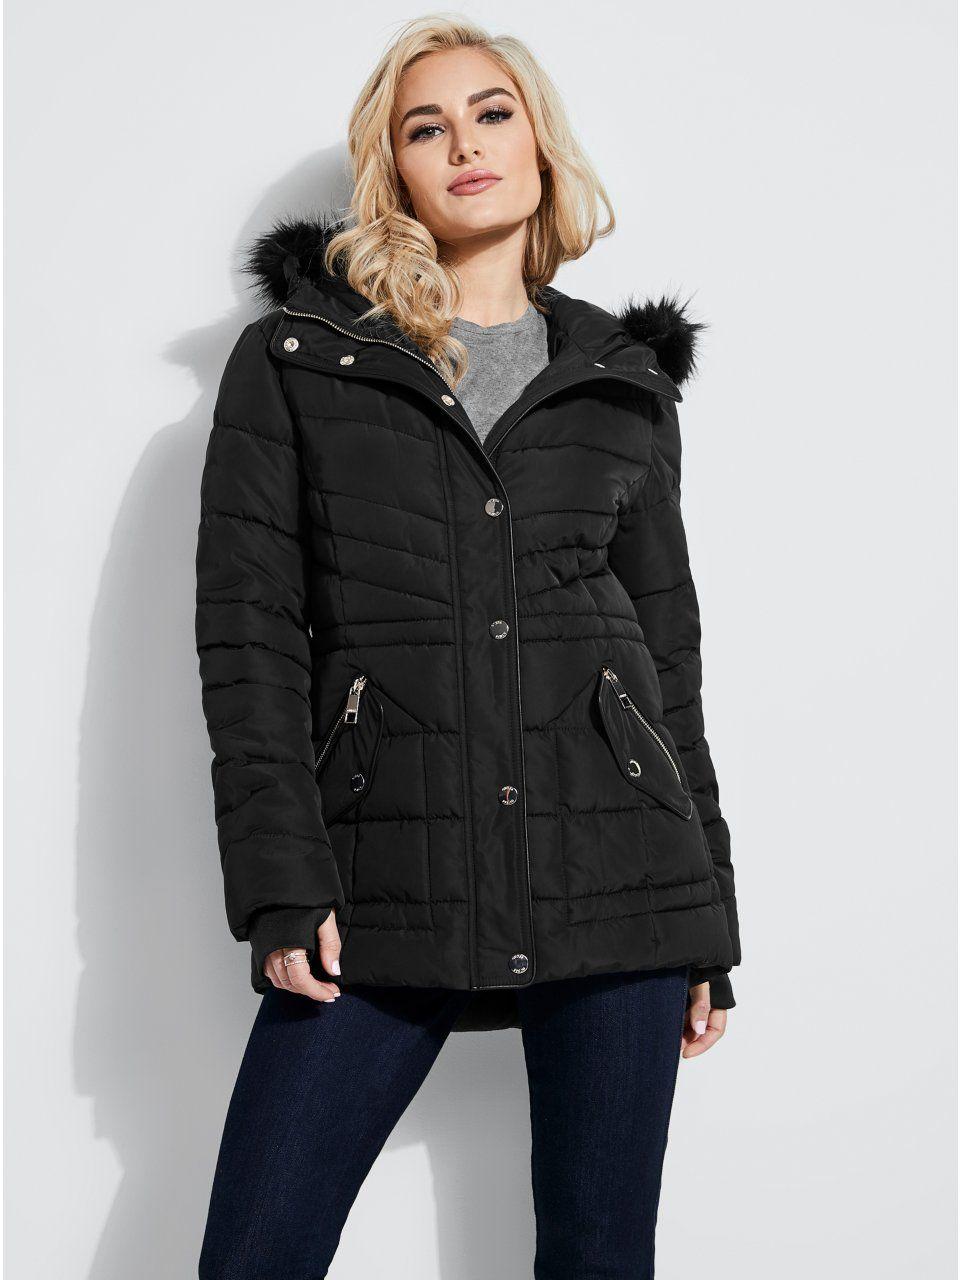 T Tahari Women/'s Gwen Faux Fur Trim Hooded Coat Short Jacket Black